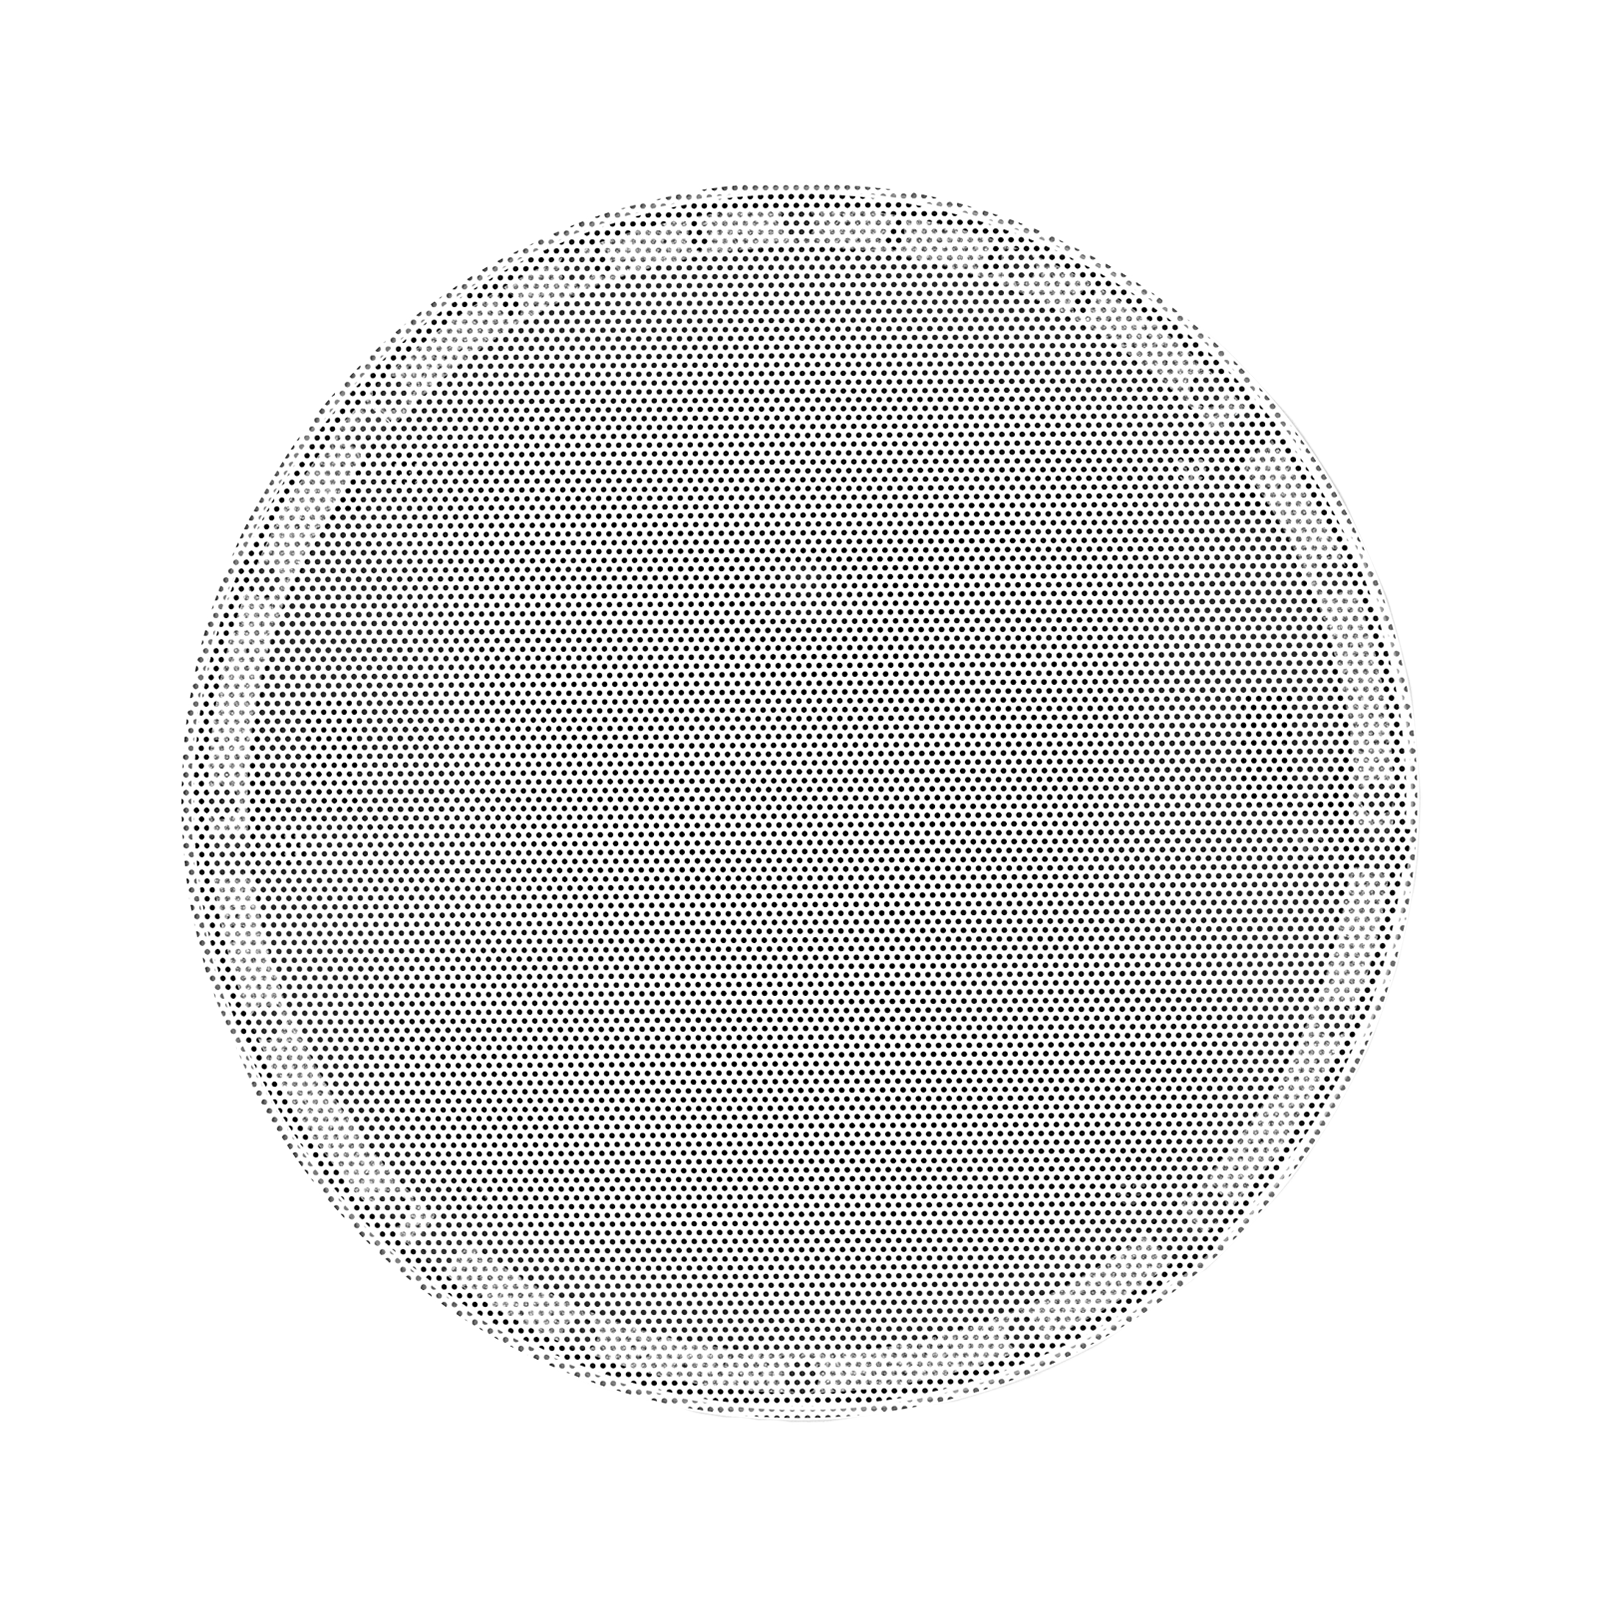 SCL-5 - Black - 2-Way 7-inch (180mm) In-Ceiling Loudspeaker - Detailshot 1